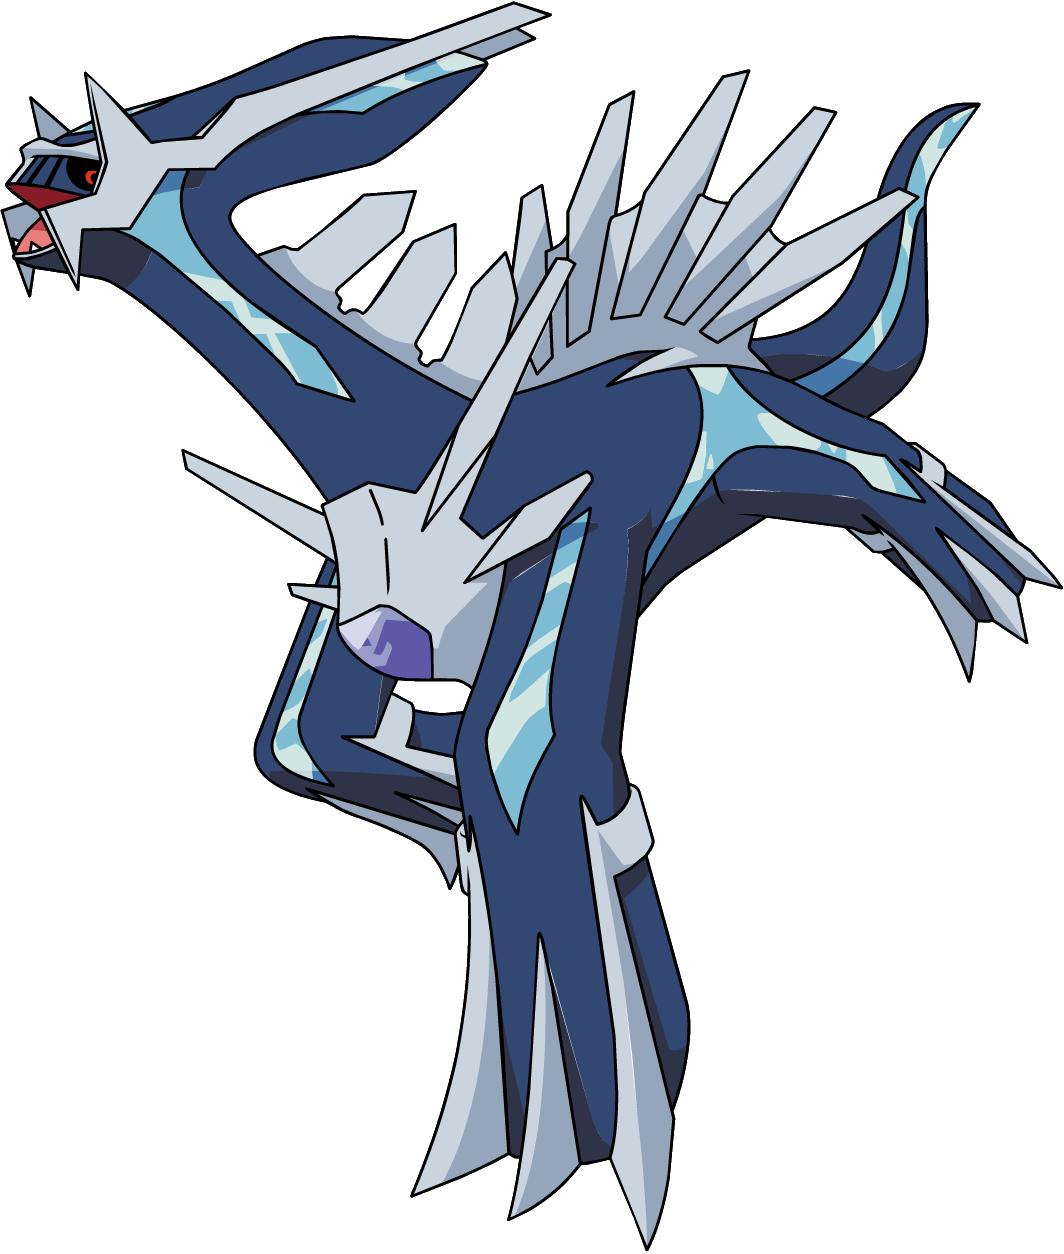 Image - 483Dialga DP anime 2.png - The Pokémon Wiki